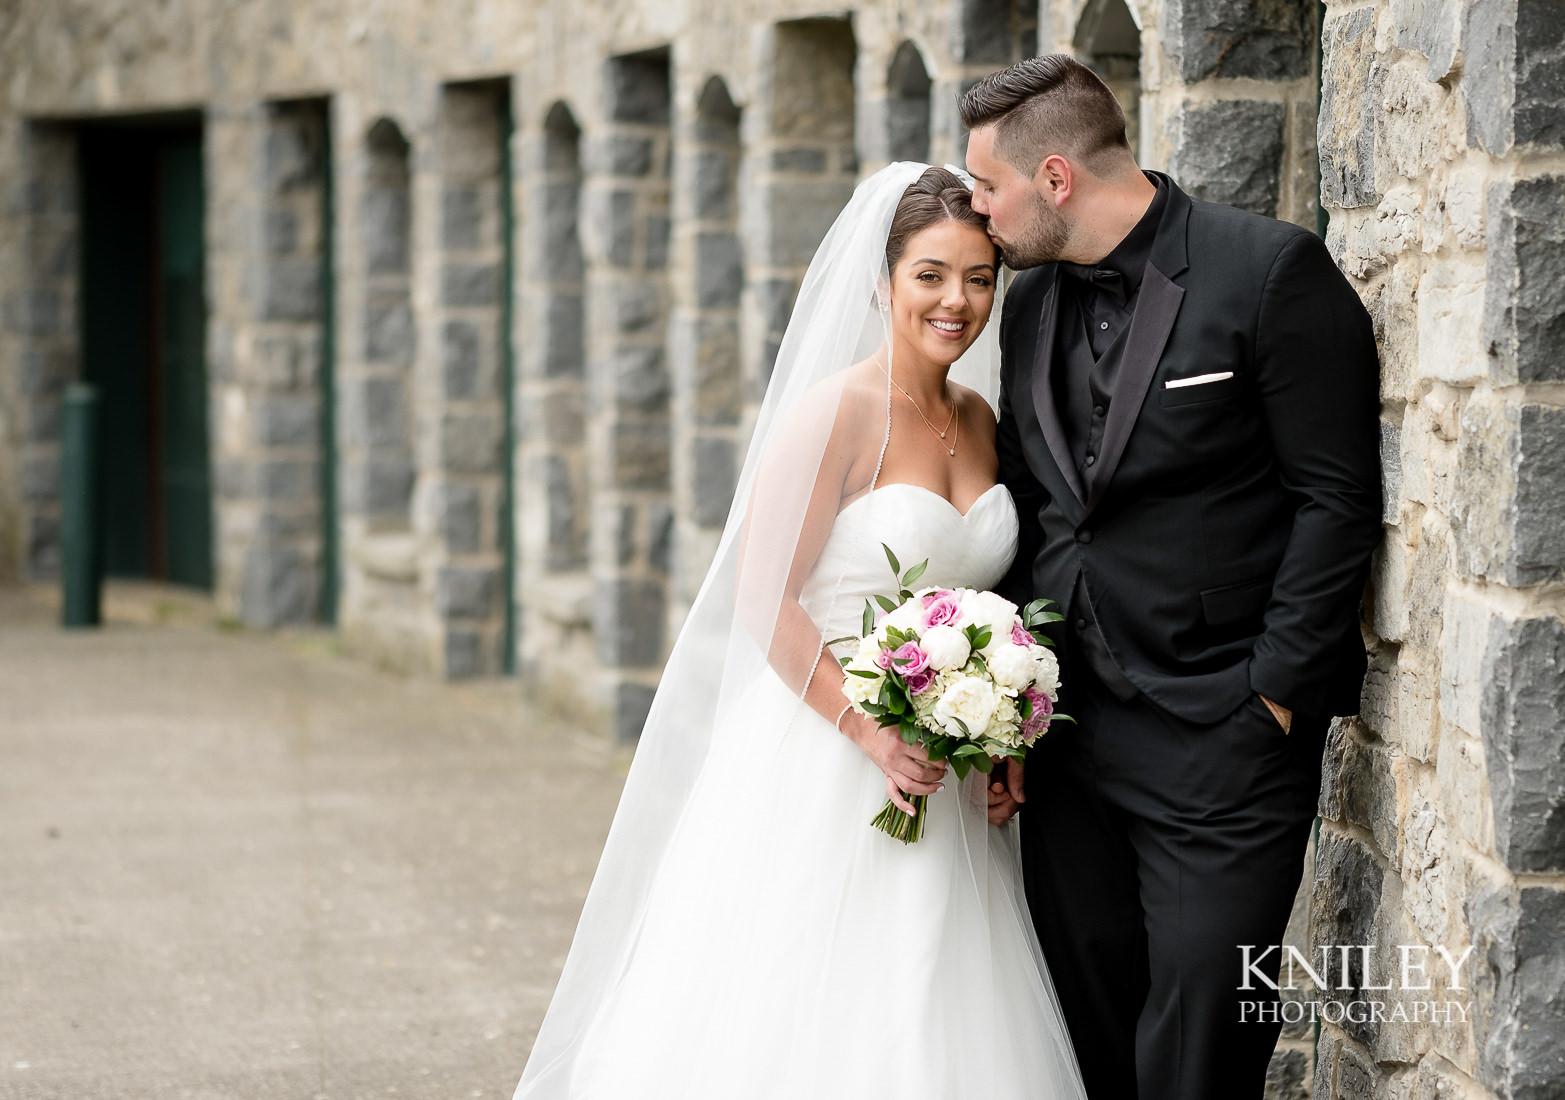 043 - Hoyt Lake Buffalo NY Wedding Pictures -XT2A7656.jpg